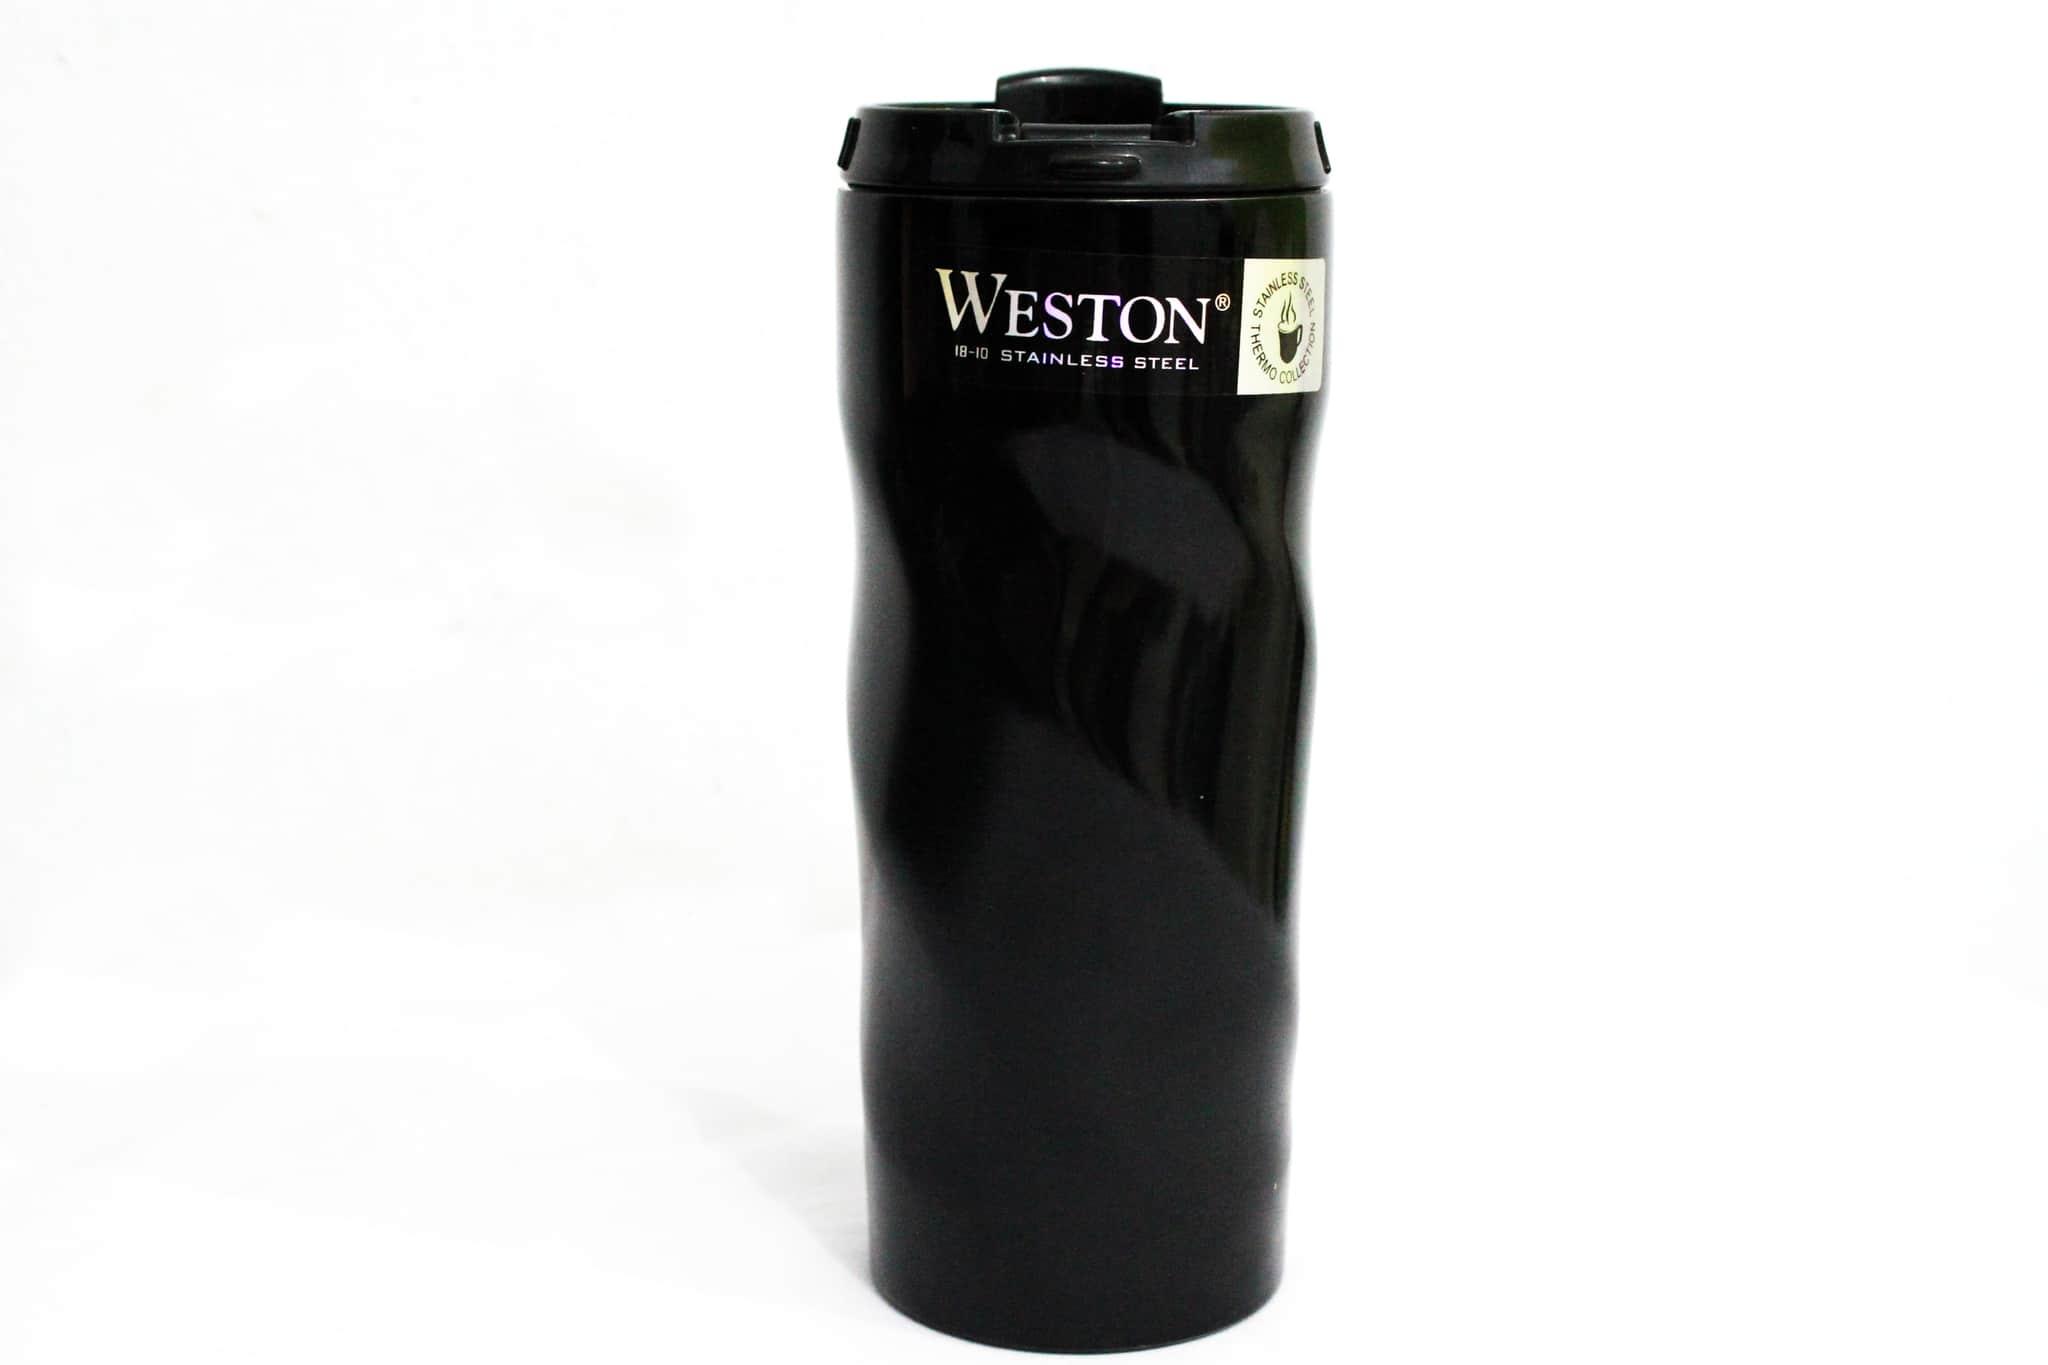 Jual Botol Minum Weston Drink Drinking Bottle Air Minuman Termos Tumbler Hitam Yb Houseware Tokopedia